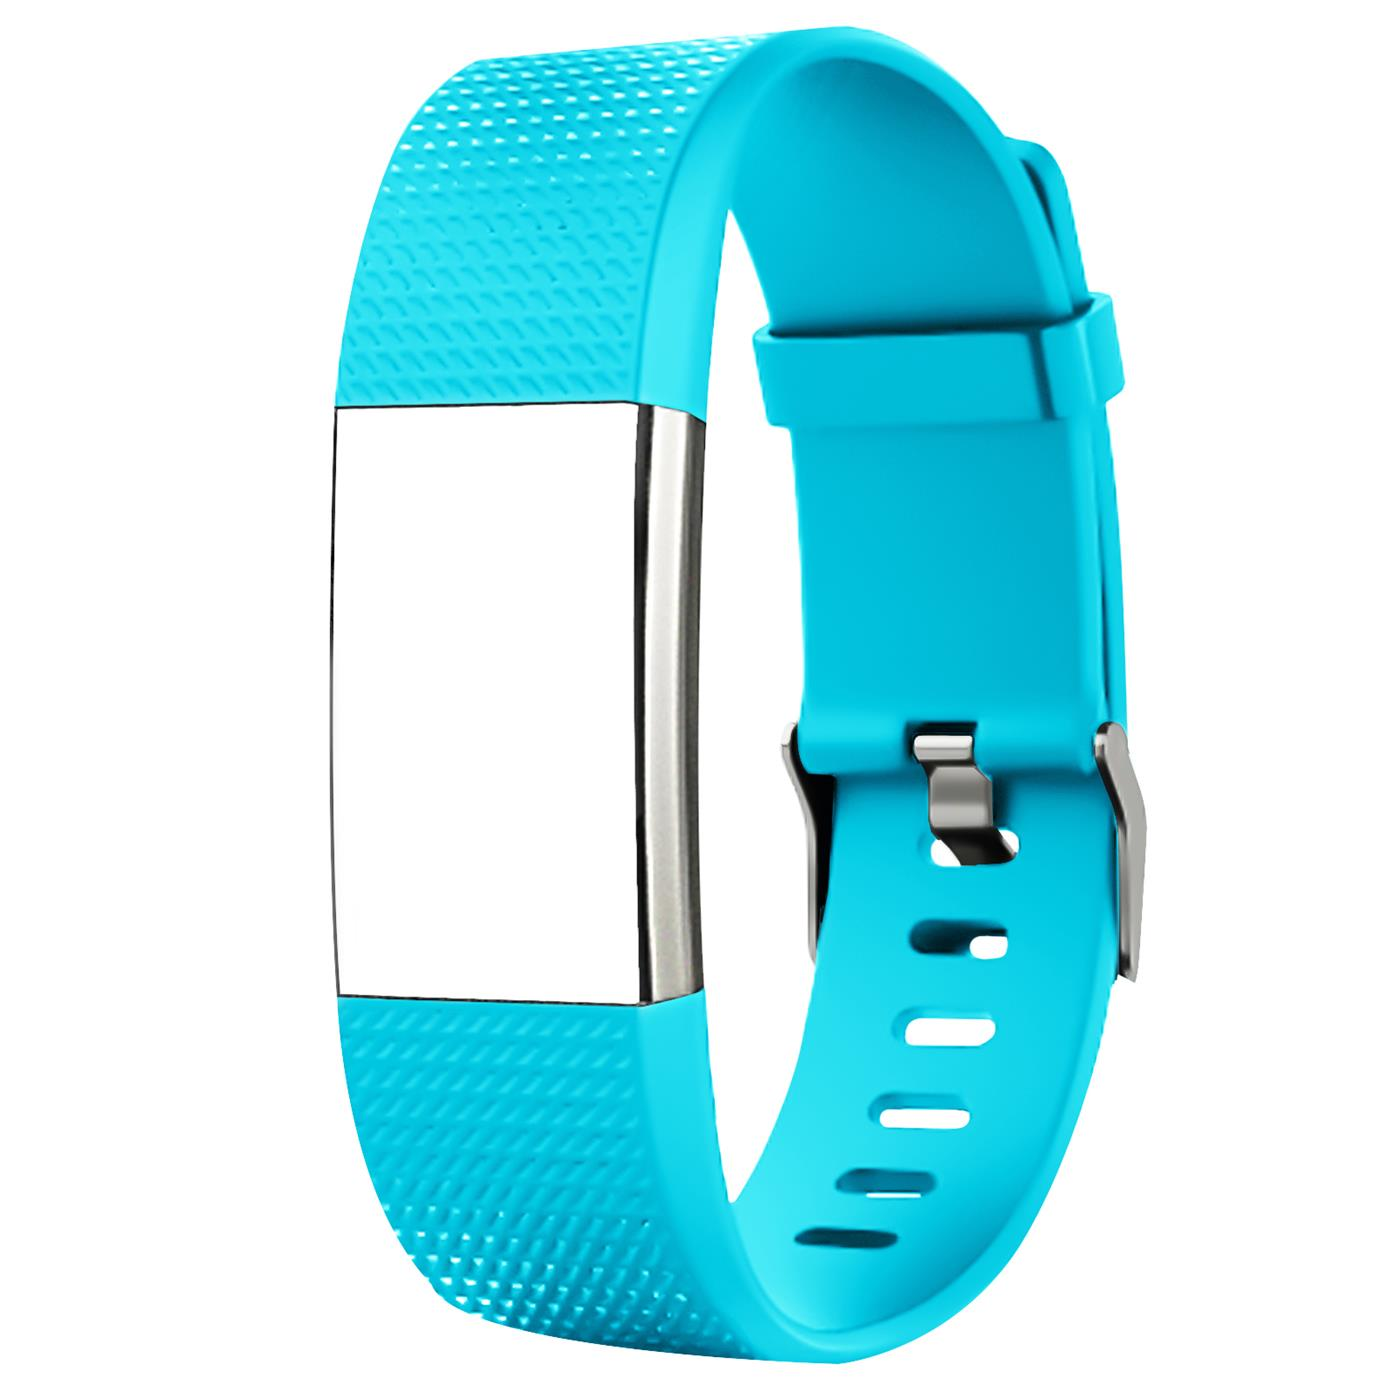 Fitbit-Groesse-S-oder-L-Ersatz-Silikon-Armband-Uhren-Sport-Band-Fitness-Tracker Indexbild 14